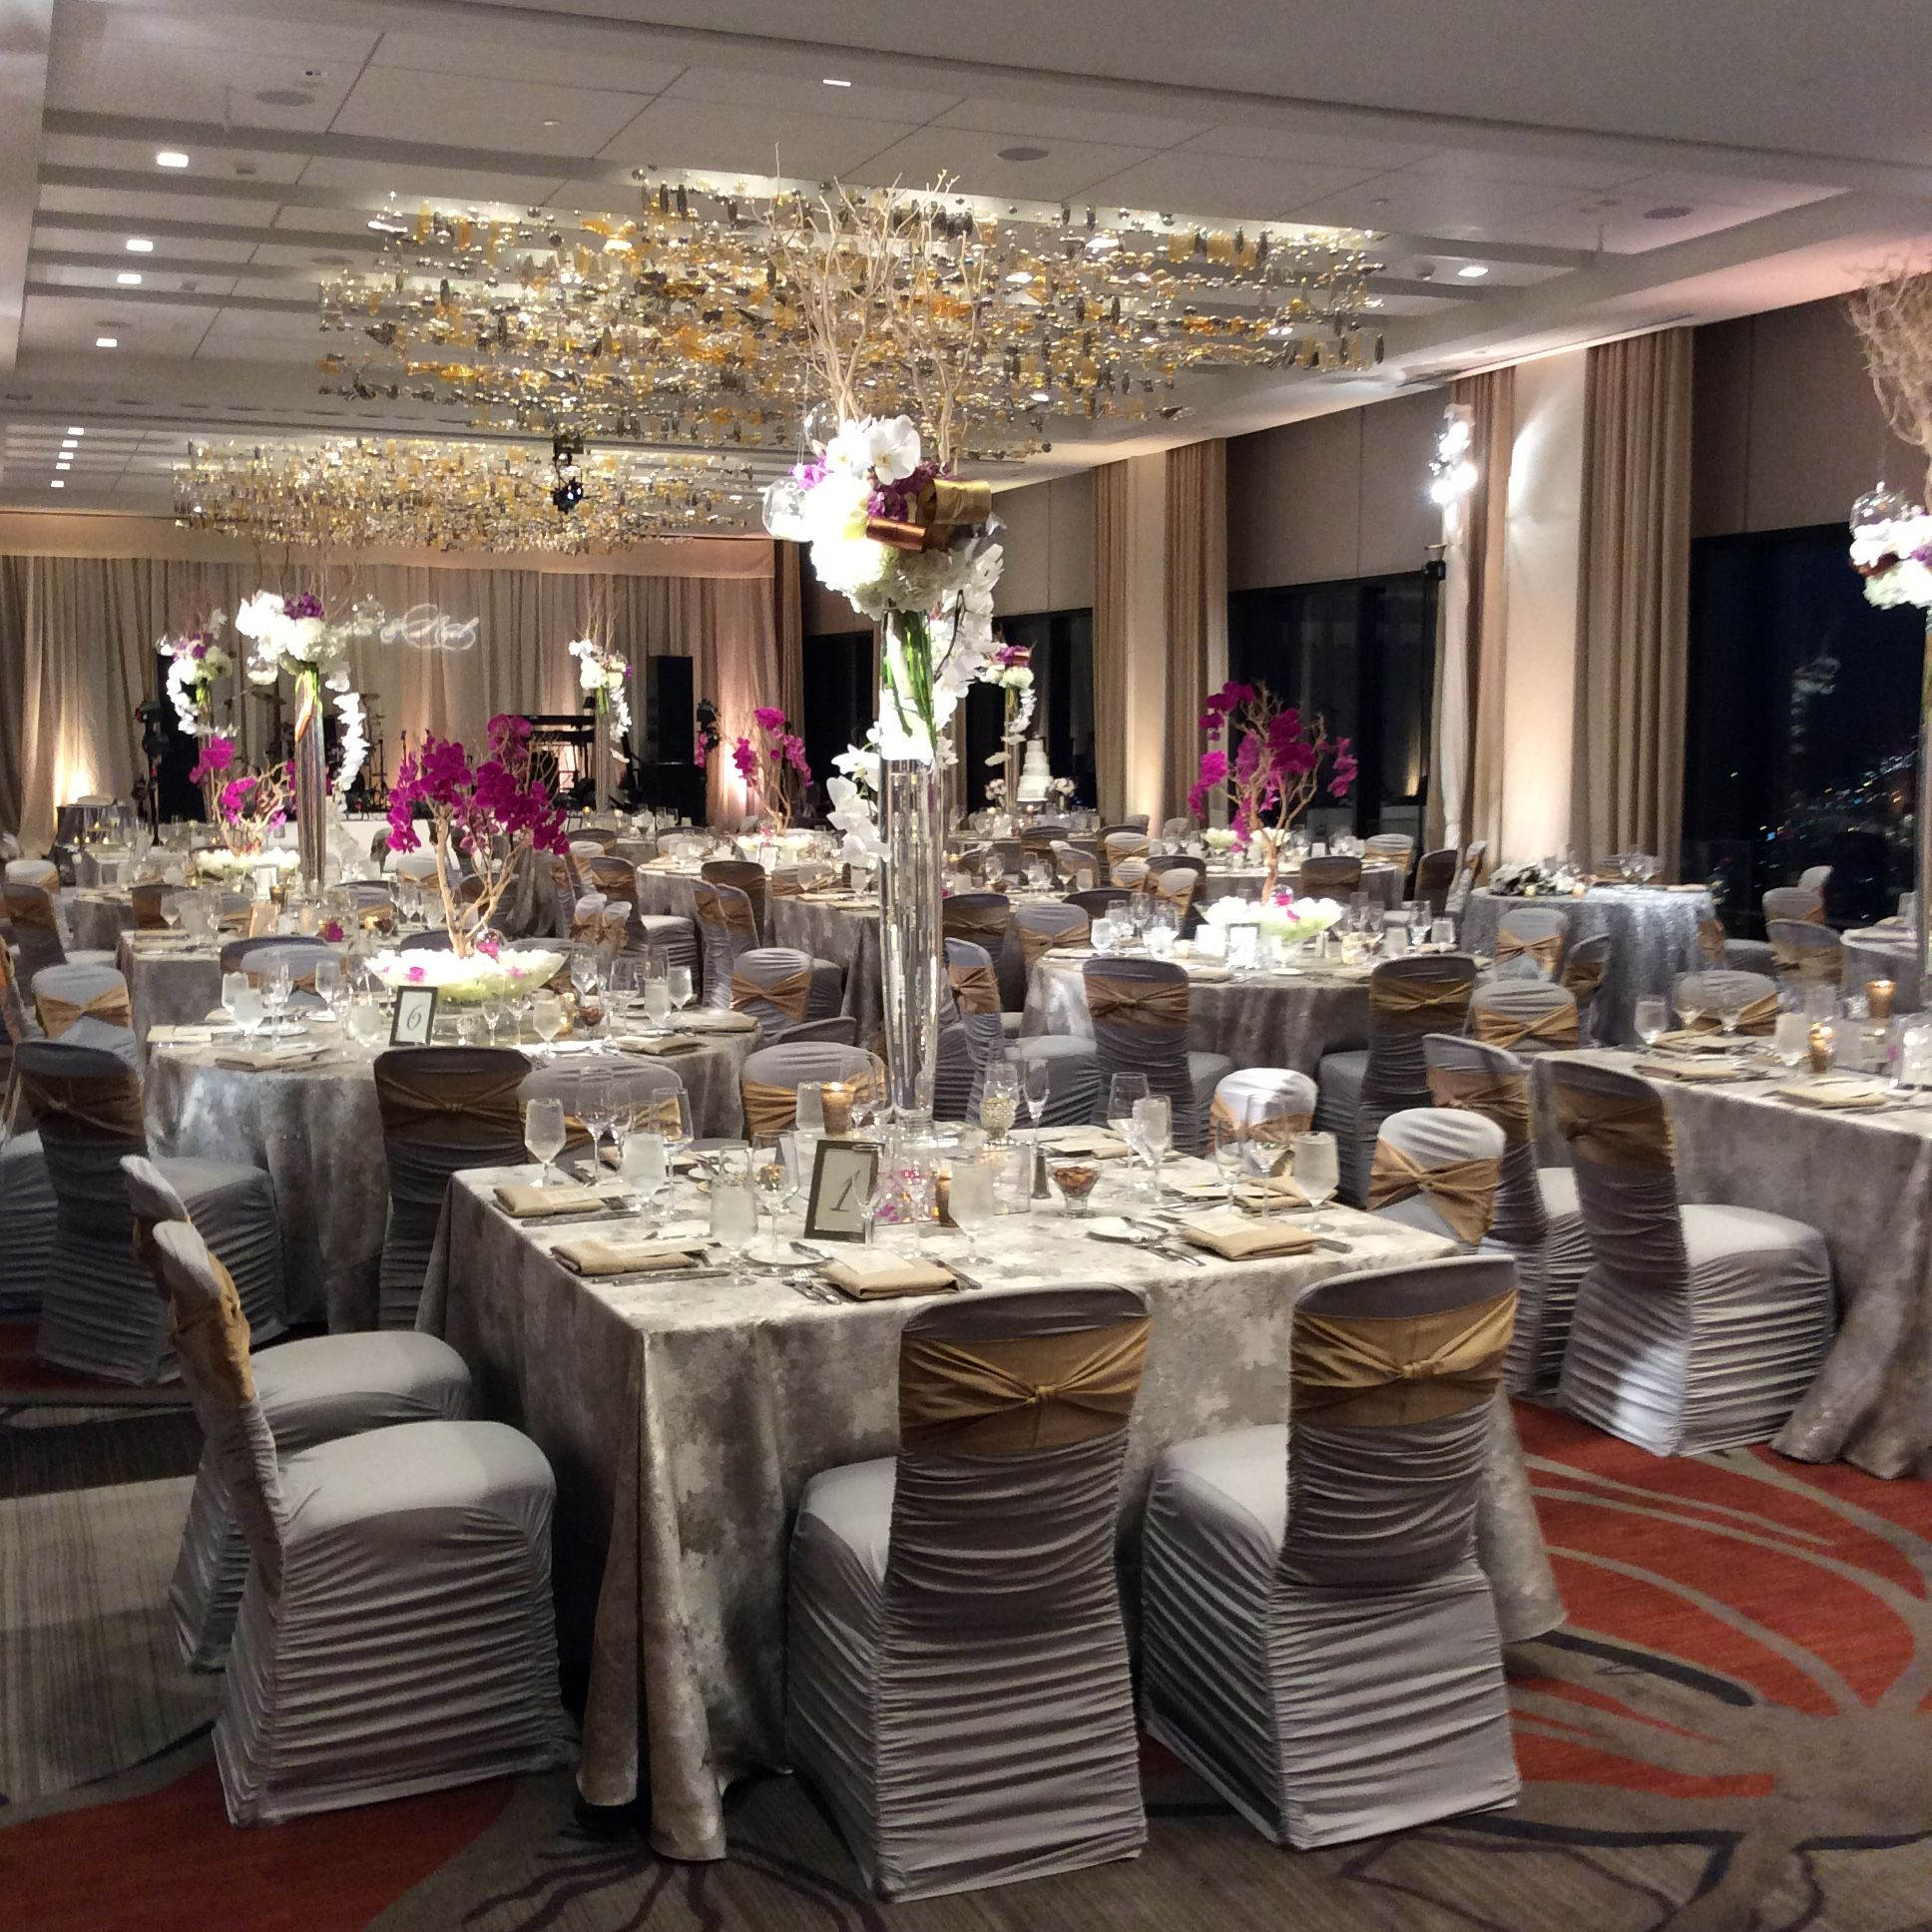 Grand Hyatt Denver Pinnacle Club Wedding Grandhyattdenver Denverwedding Venue